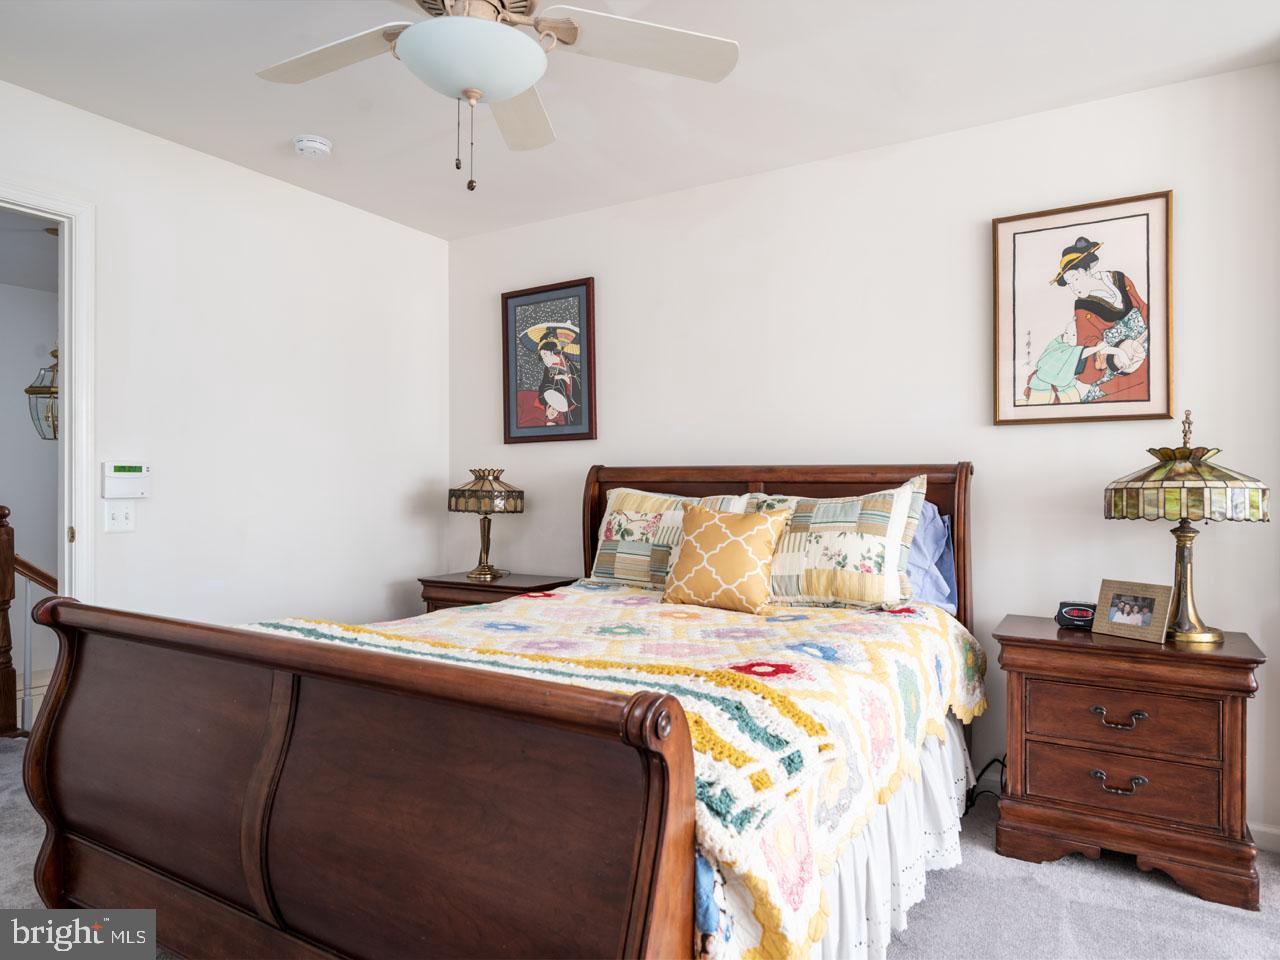 VAFX1104336-302201656836-2021-07-16-19-45-24  |   | Alexandria Delaware Real Estate For Sale | MLS# Vafx1104336  - Best of Northern Virginia